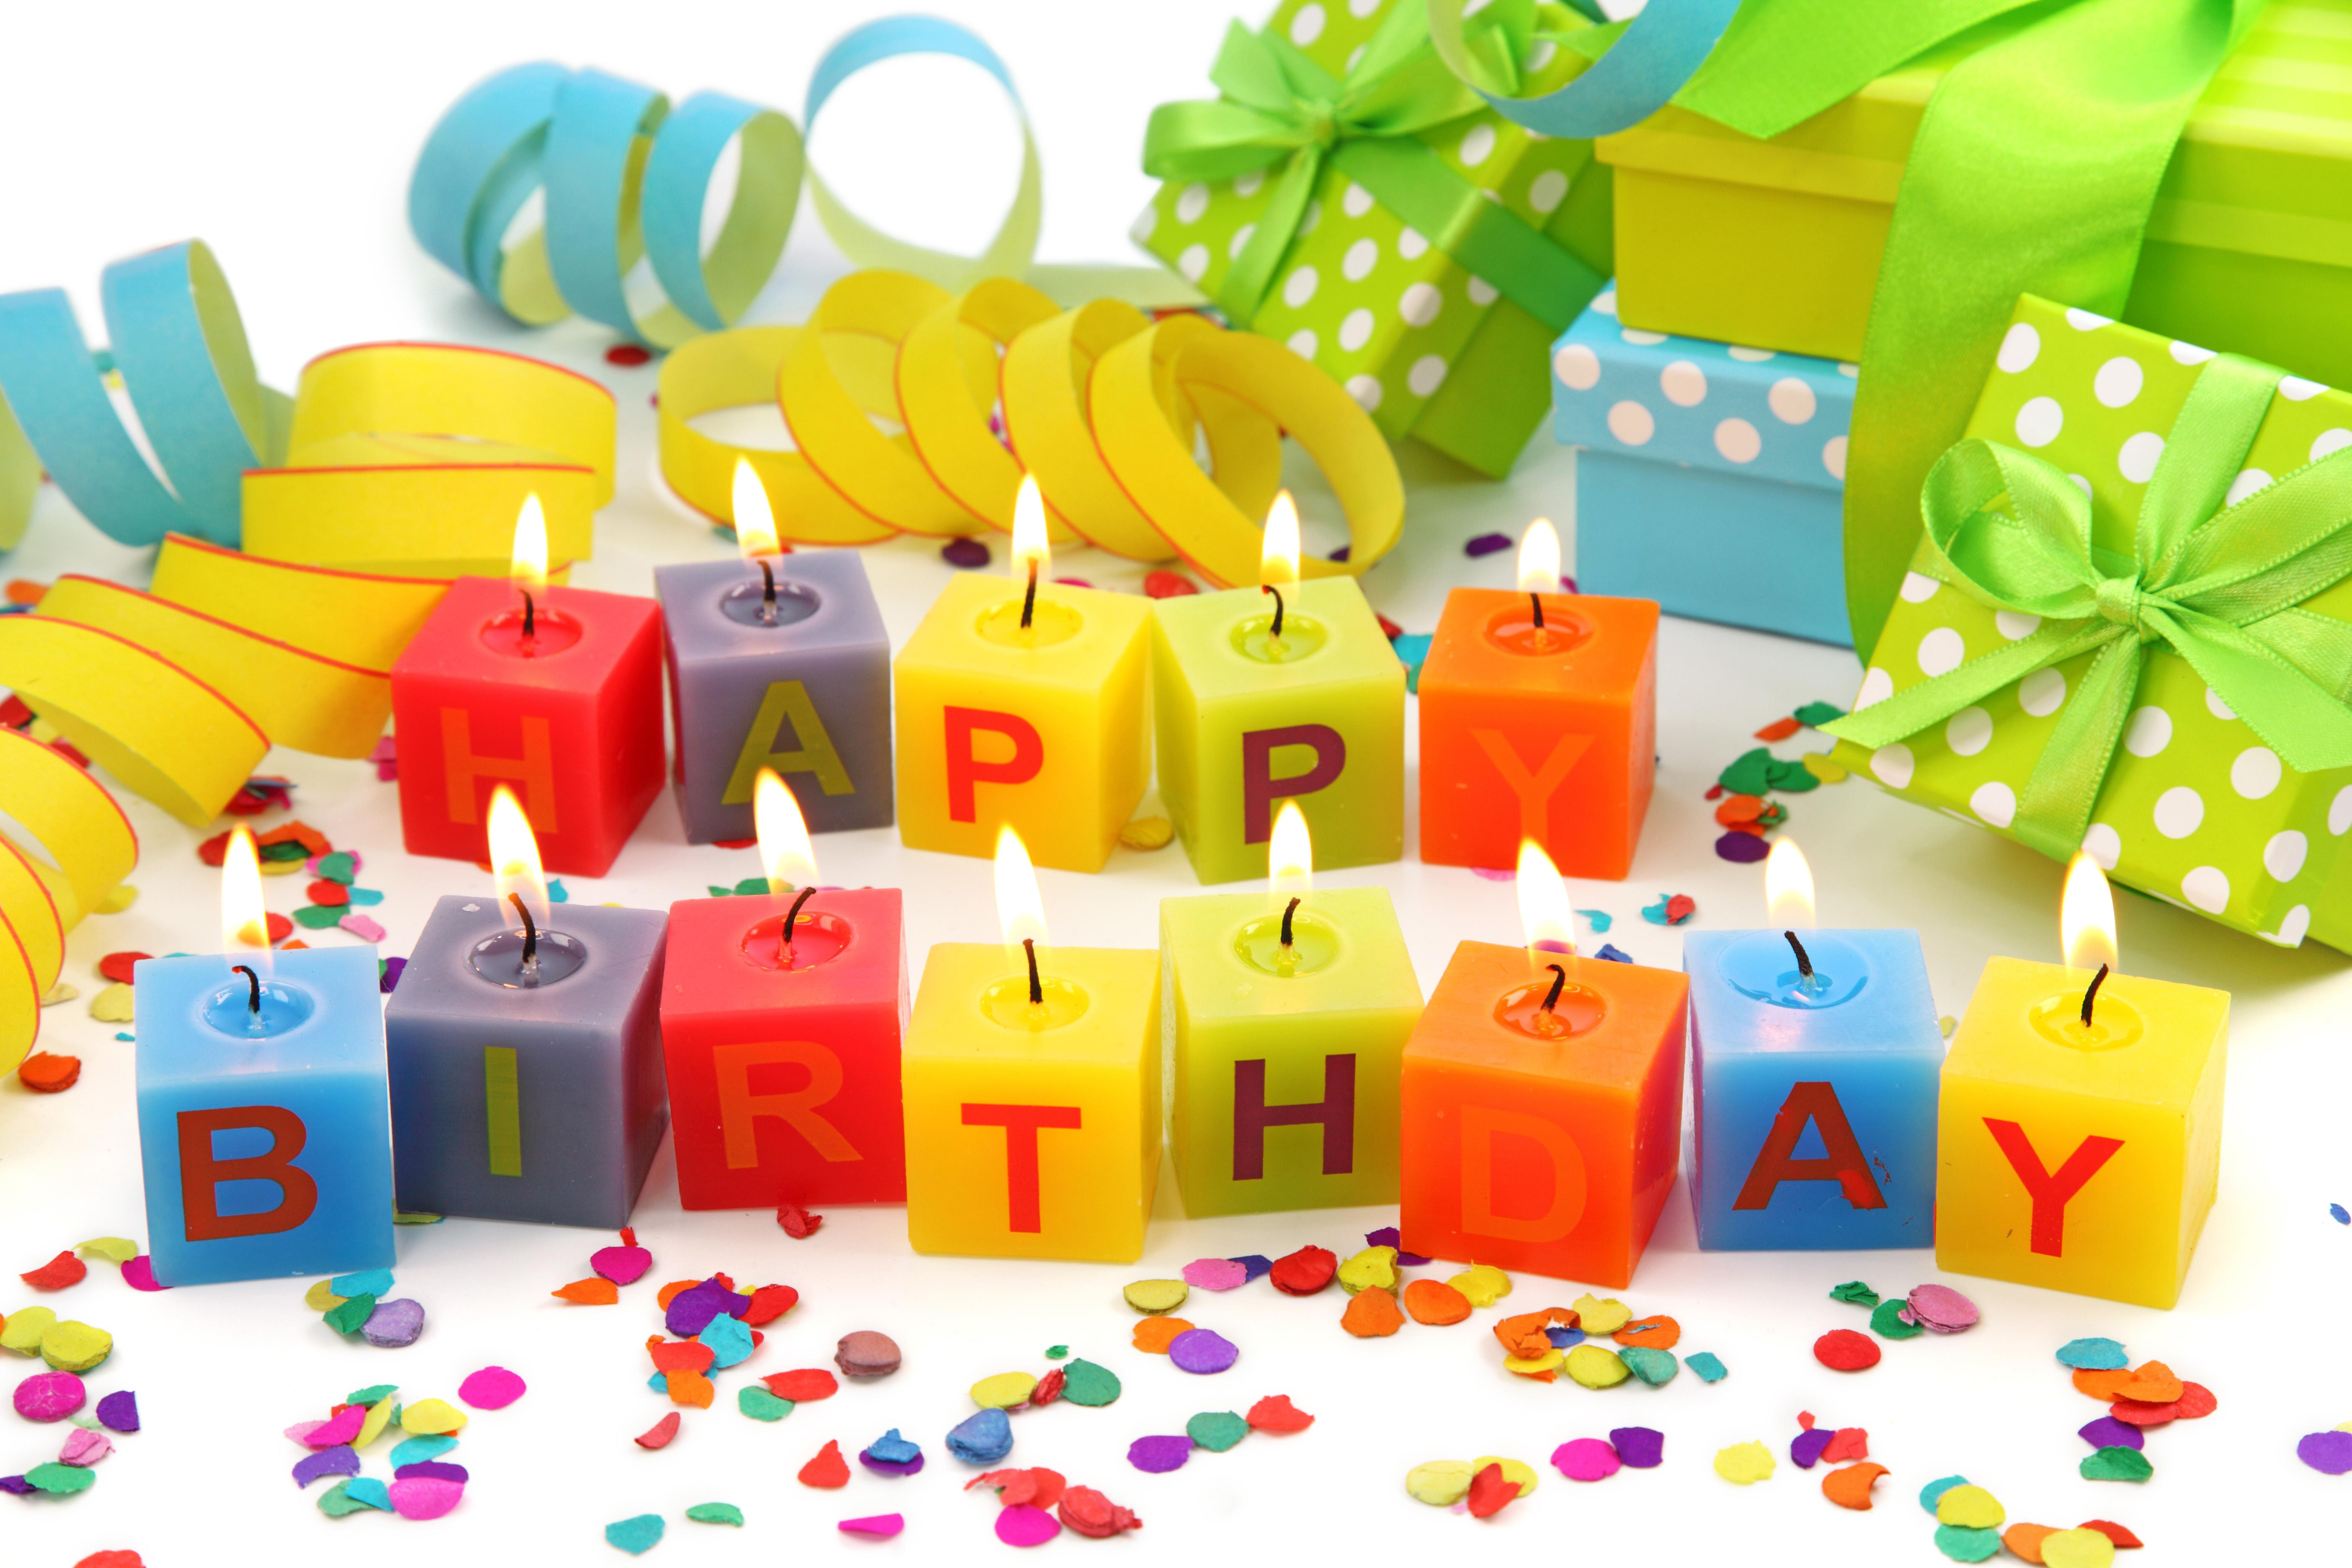 Hd wallpaper birthday -  Birthday Chocolate Cake Wallpaper Hd Download